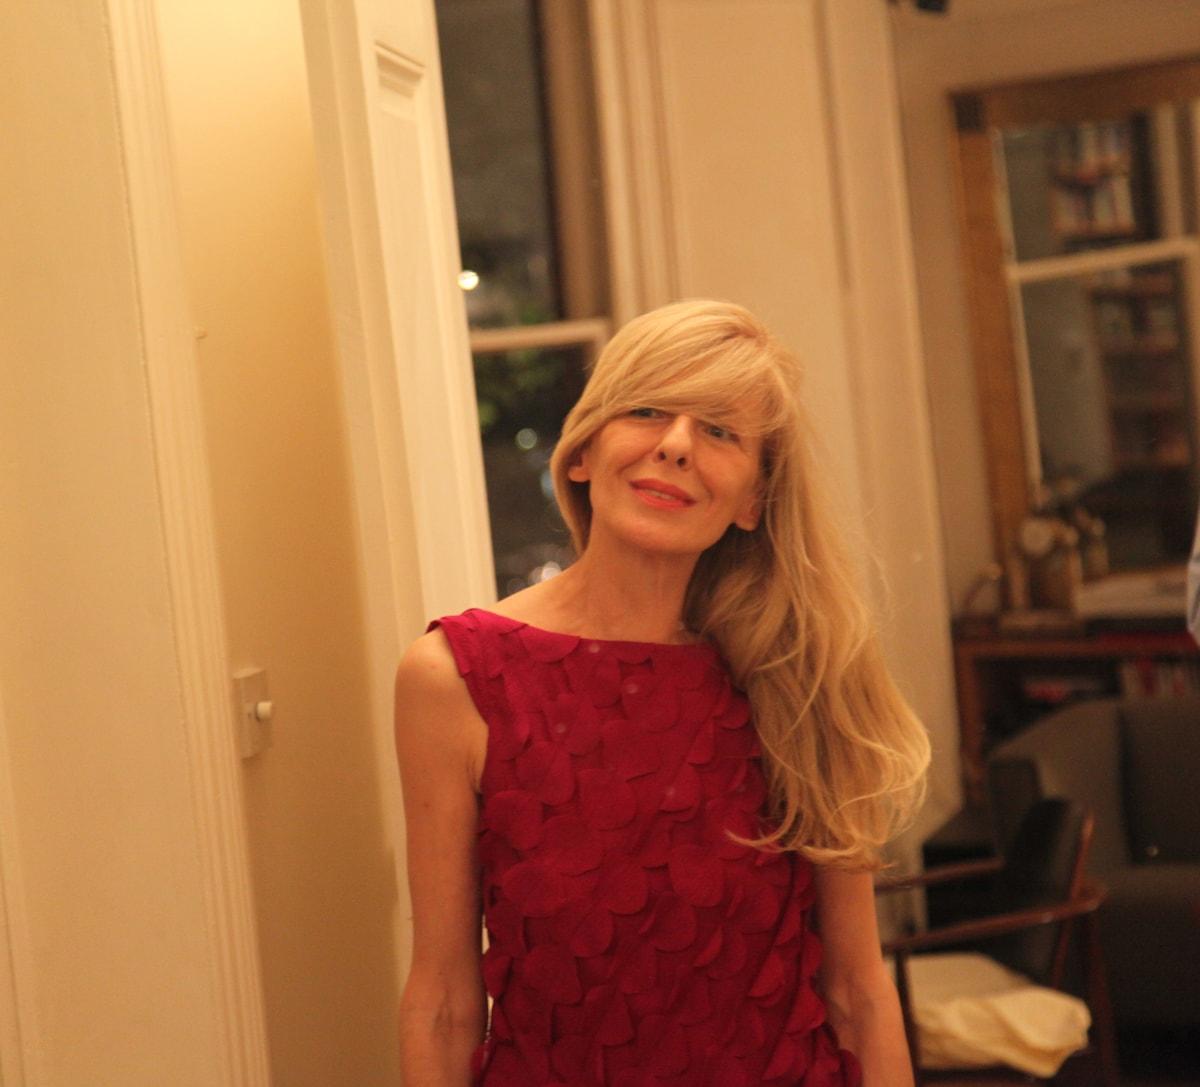 Olga from London